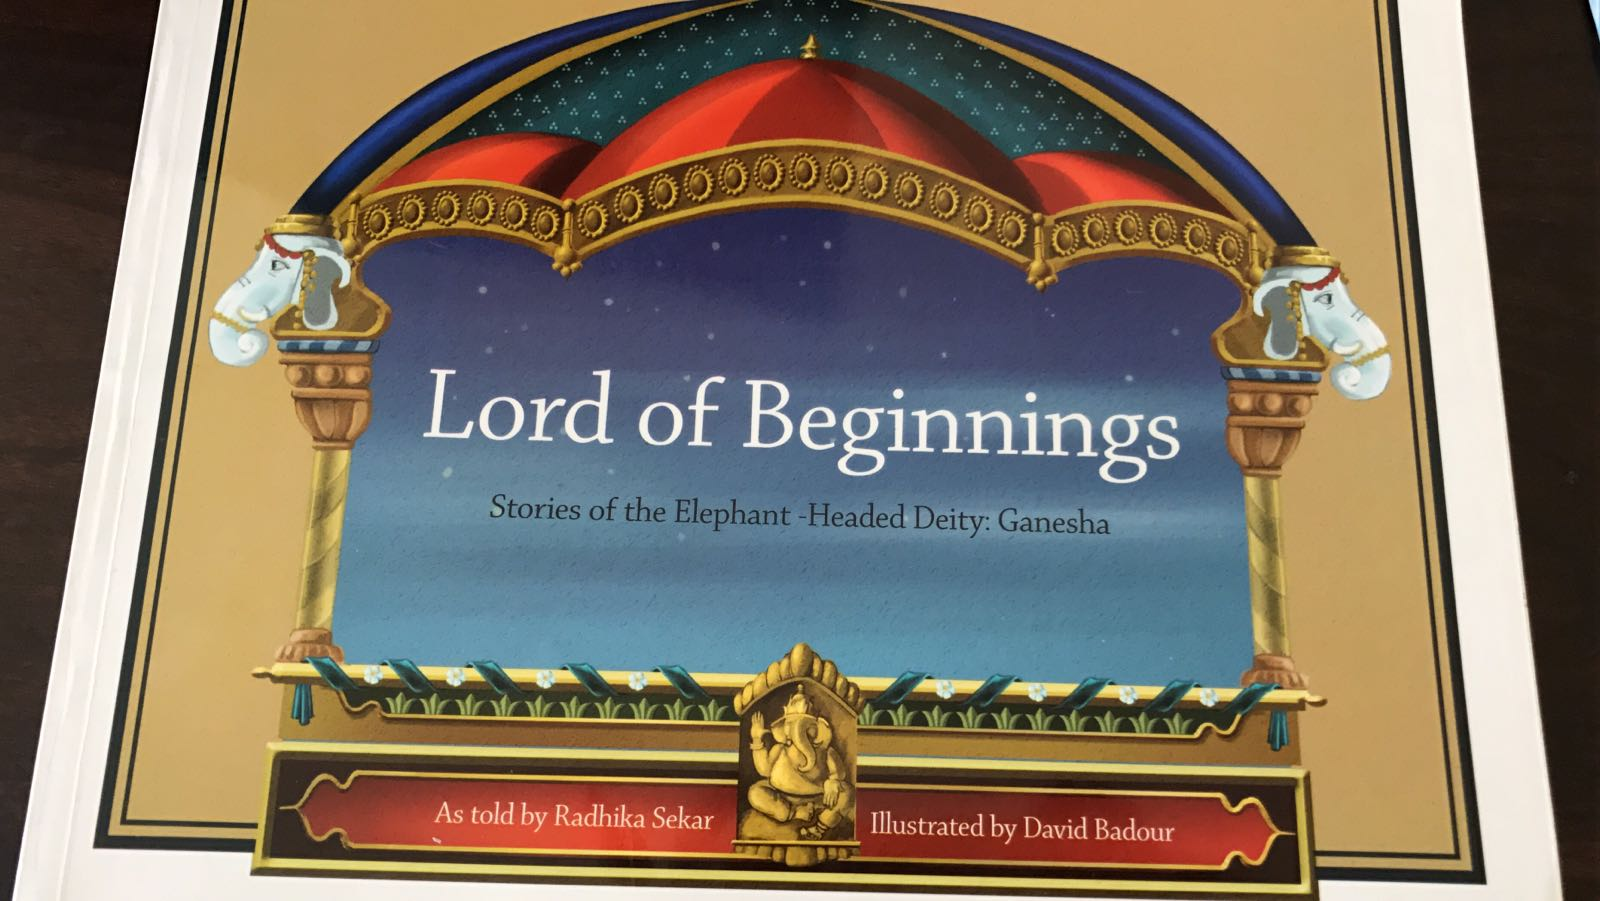 Lord of Beginnings - Stories of the Elephant-Headed Deity, Ganesha